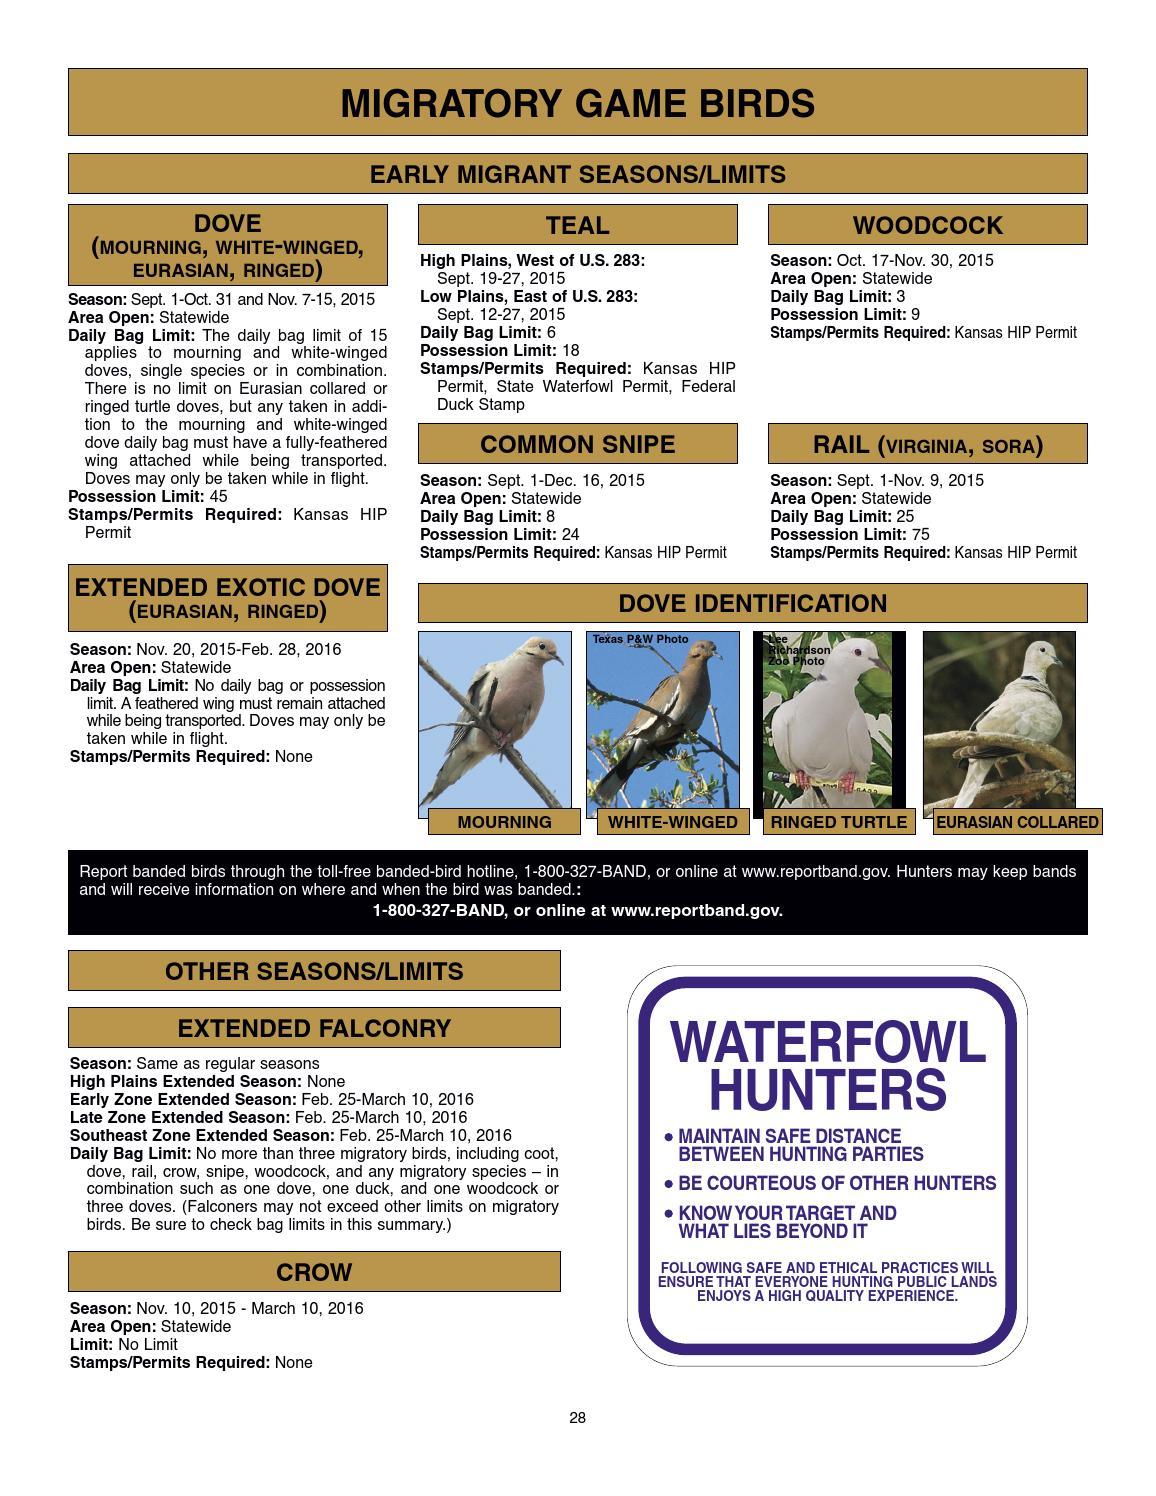 2015 kansas hunting regulations summary by kansas for Kansas fishing license